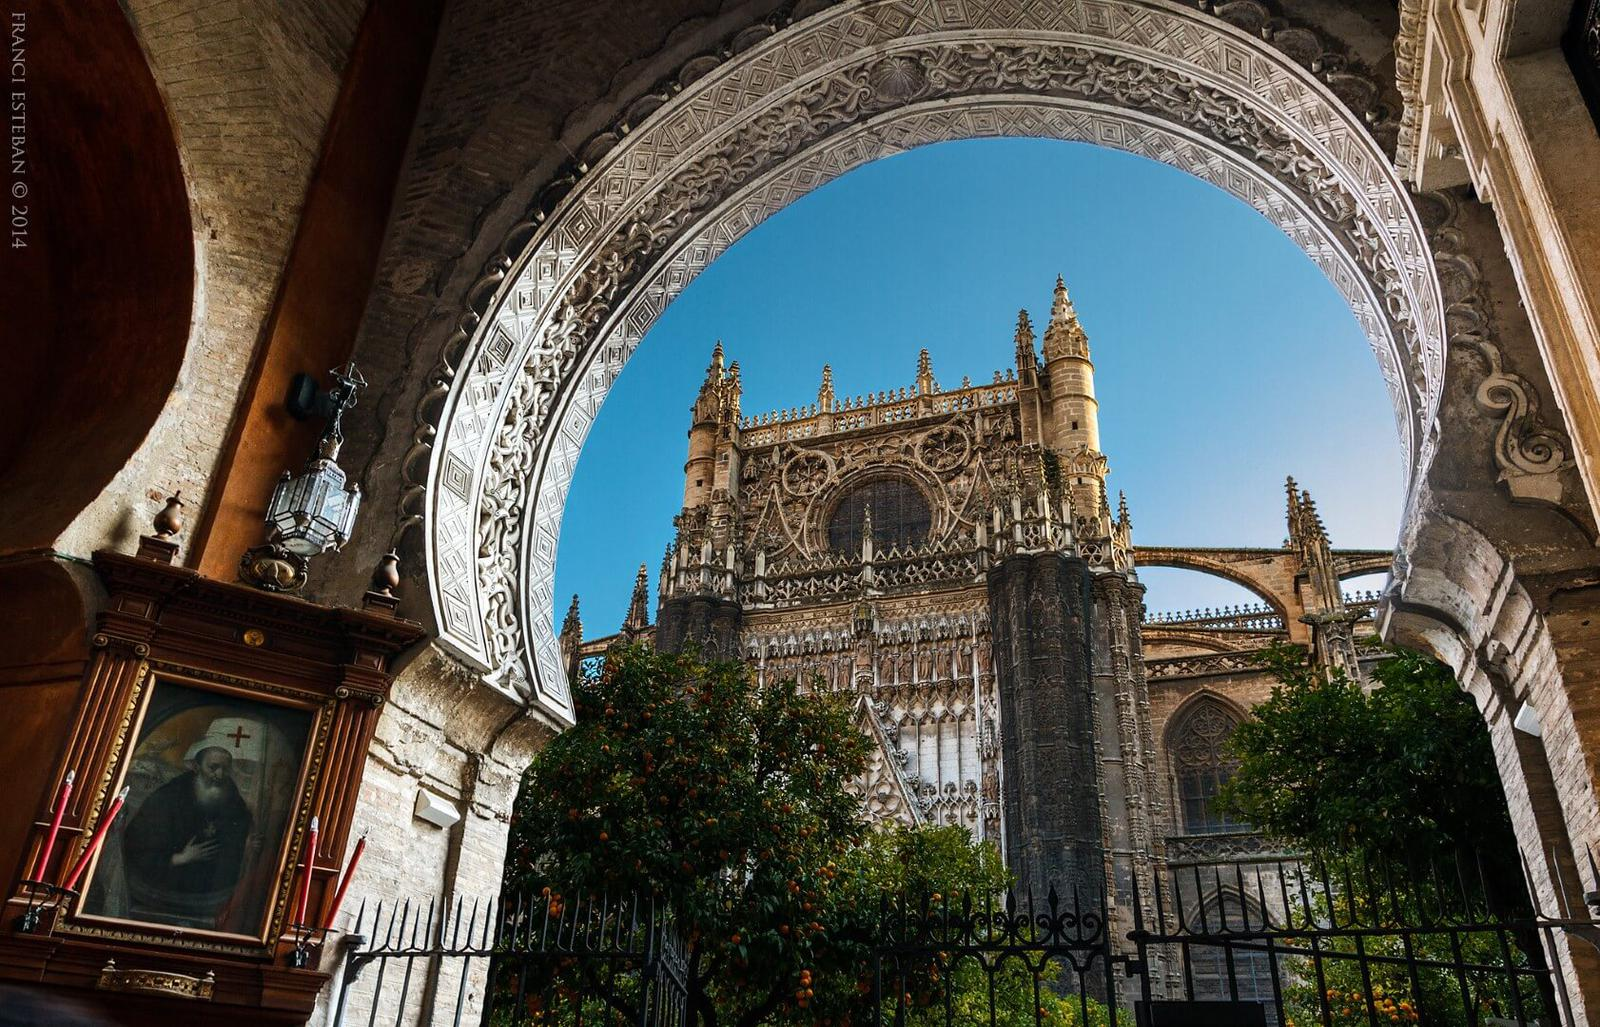 Spain_Andalusia_Sevilla_Cathedral_Flickr_Francisco Manuel Esteban